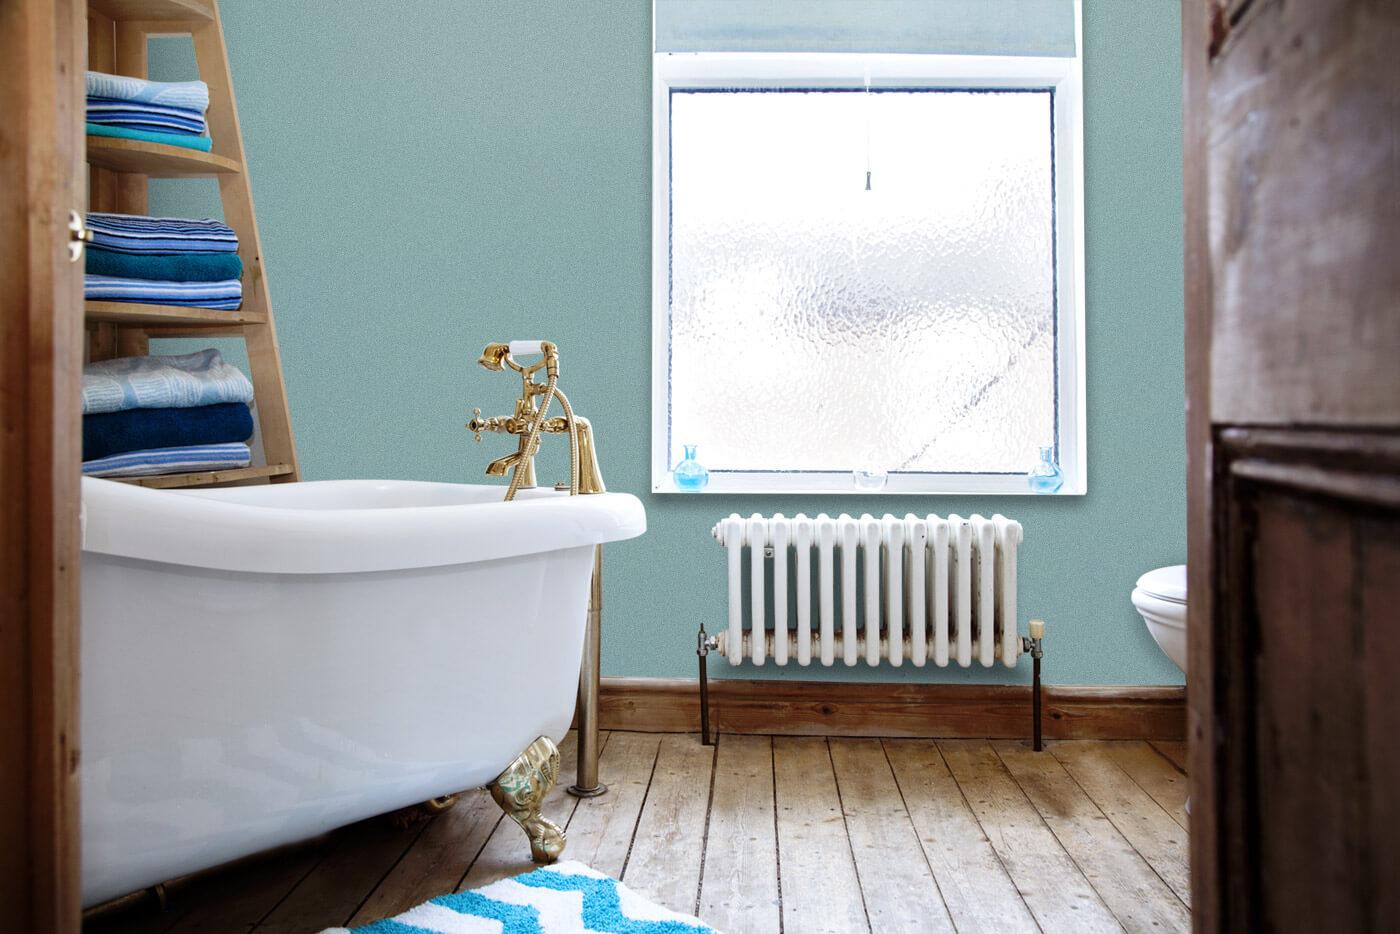 Aquamax Azure Shimmer Shower Panel - Bathroom Cladding Store